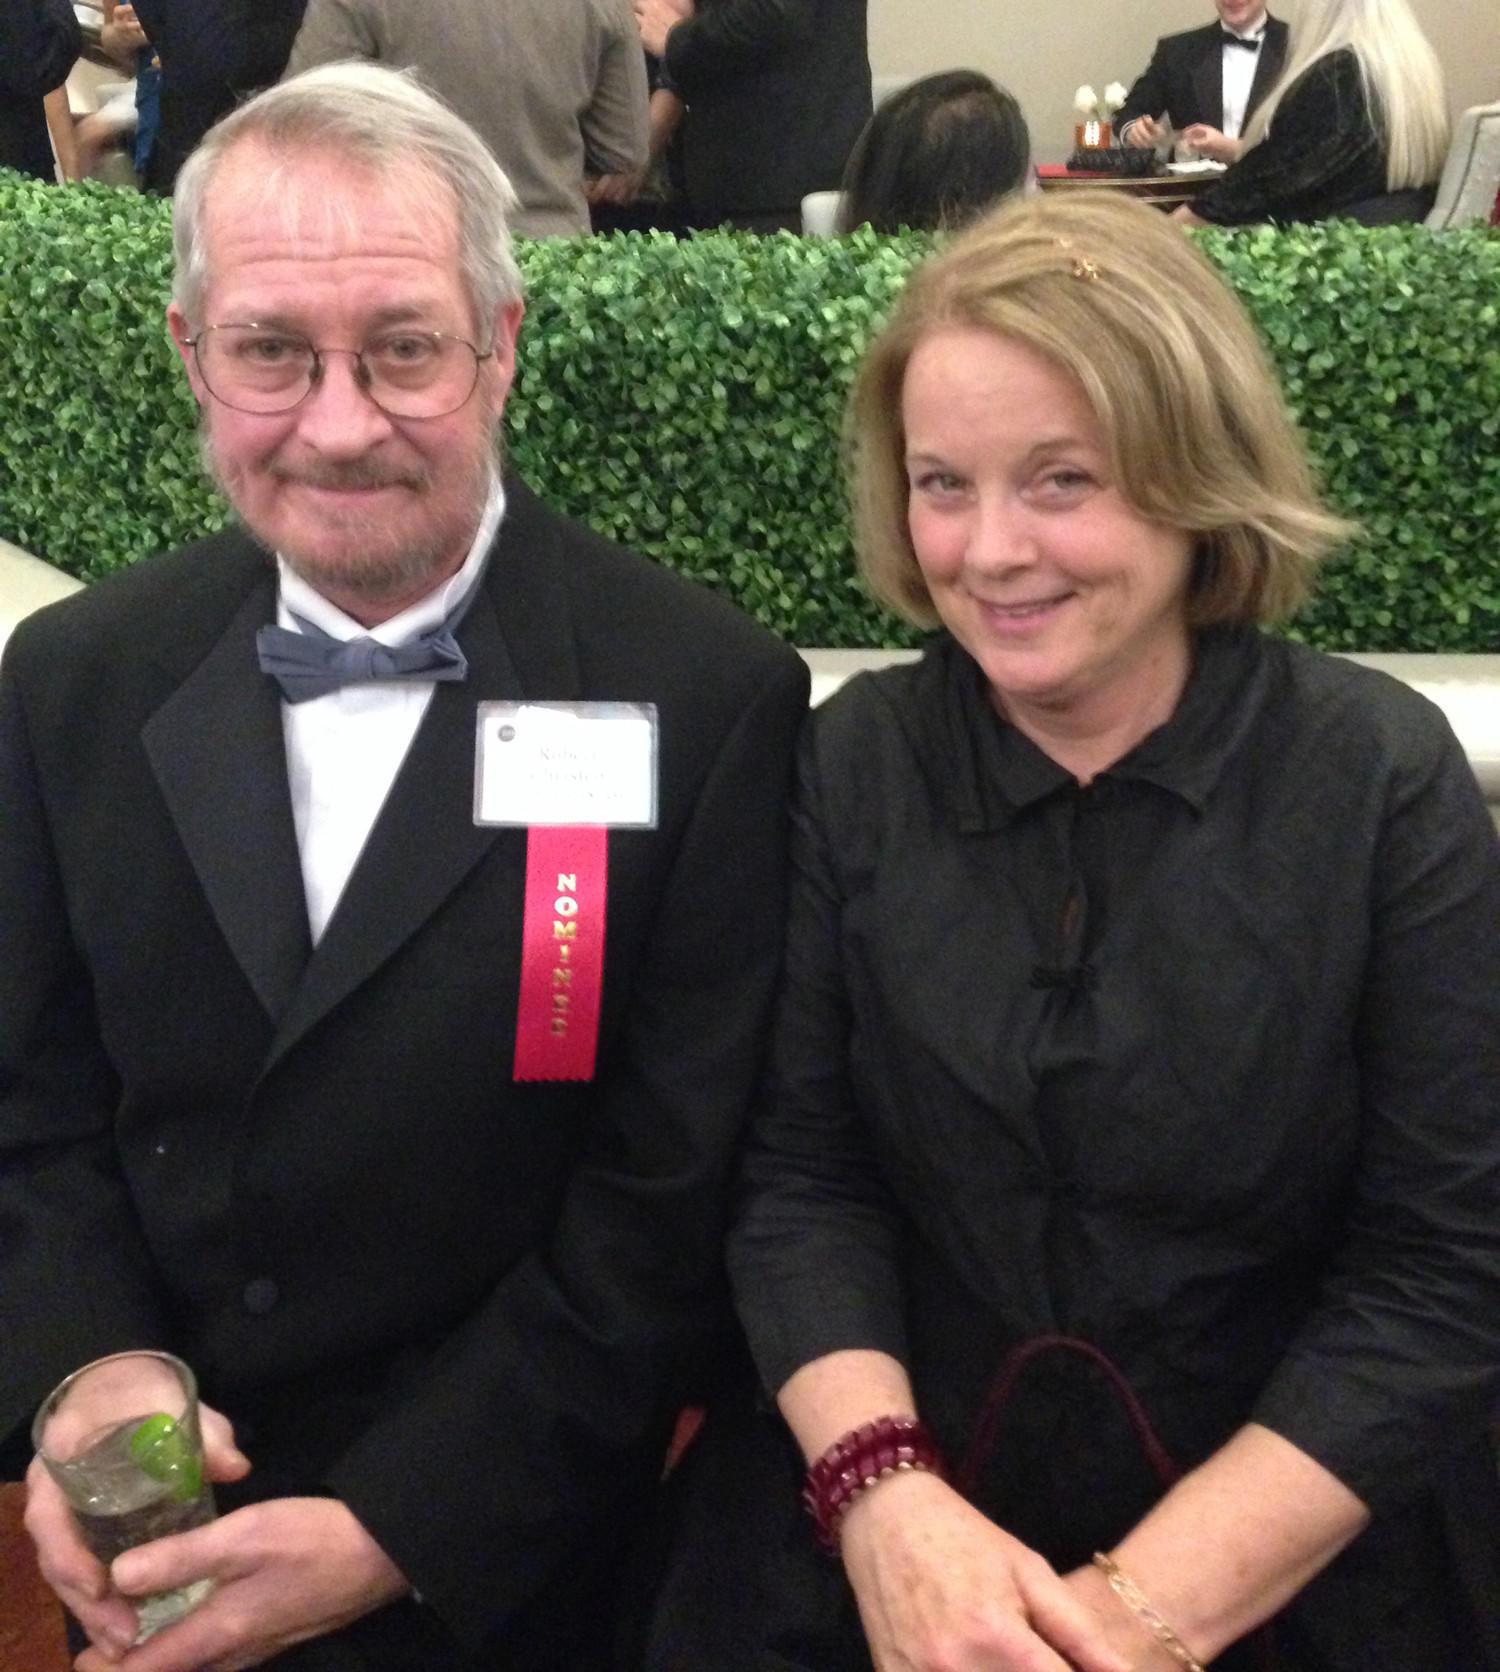 Robert Christen and his wife, Jan Watson